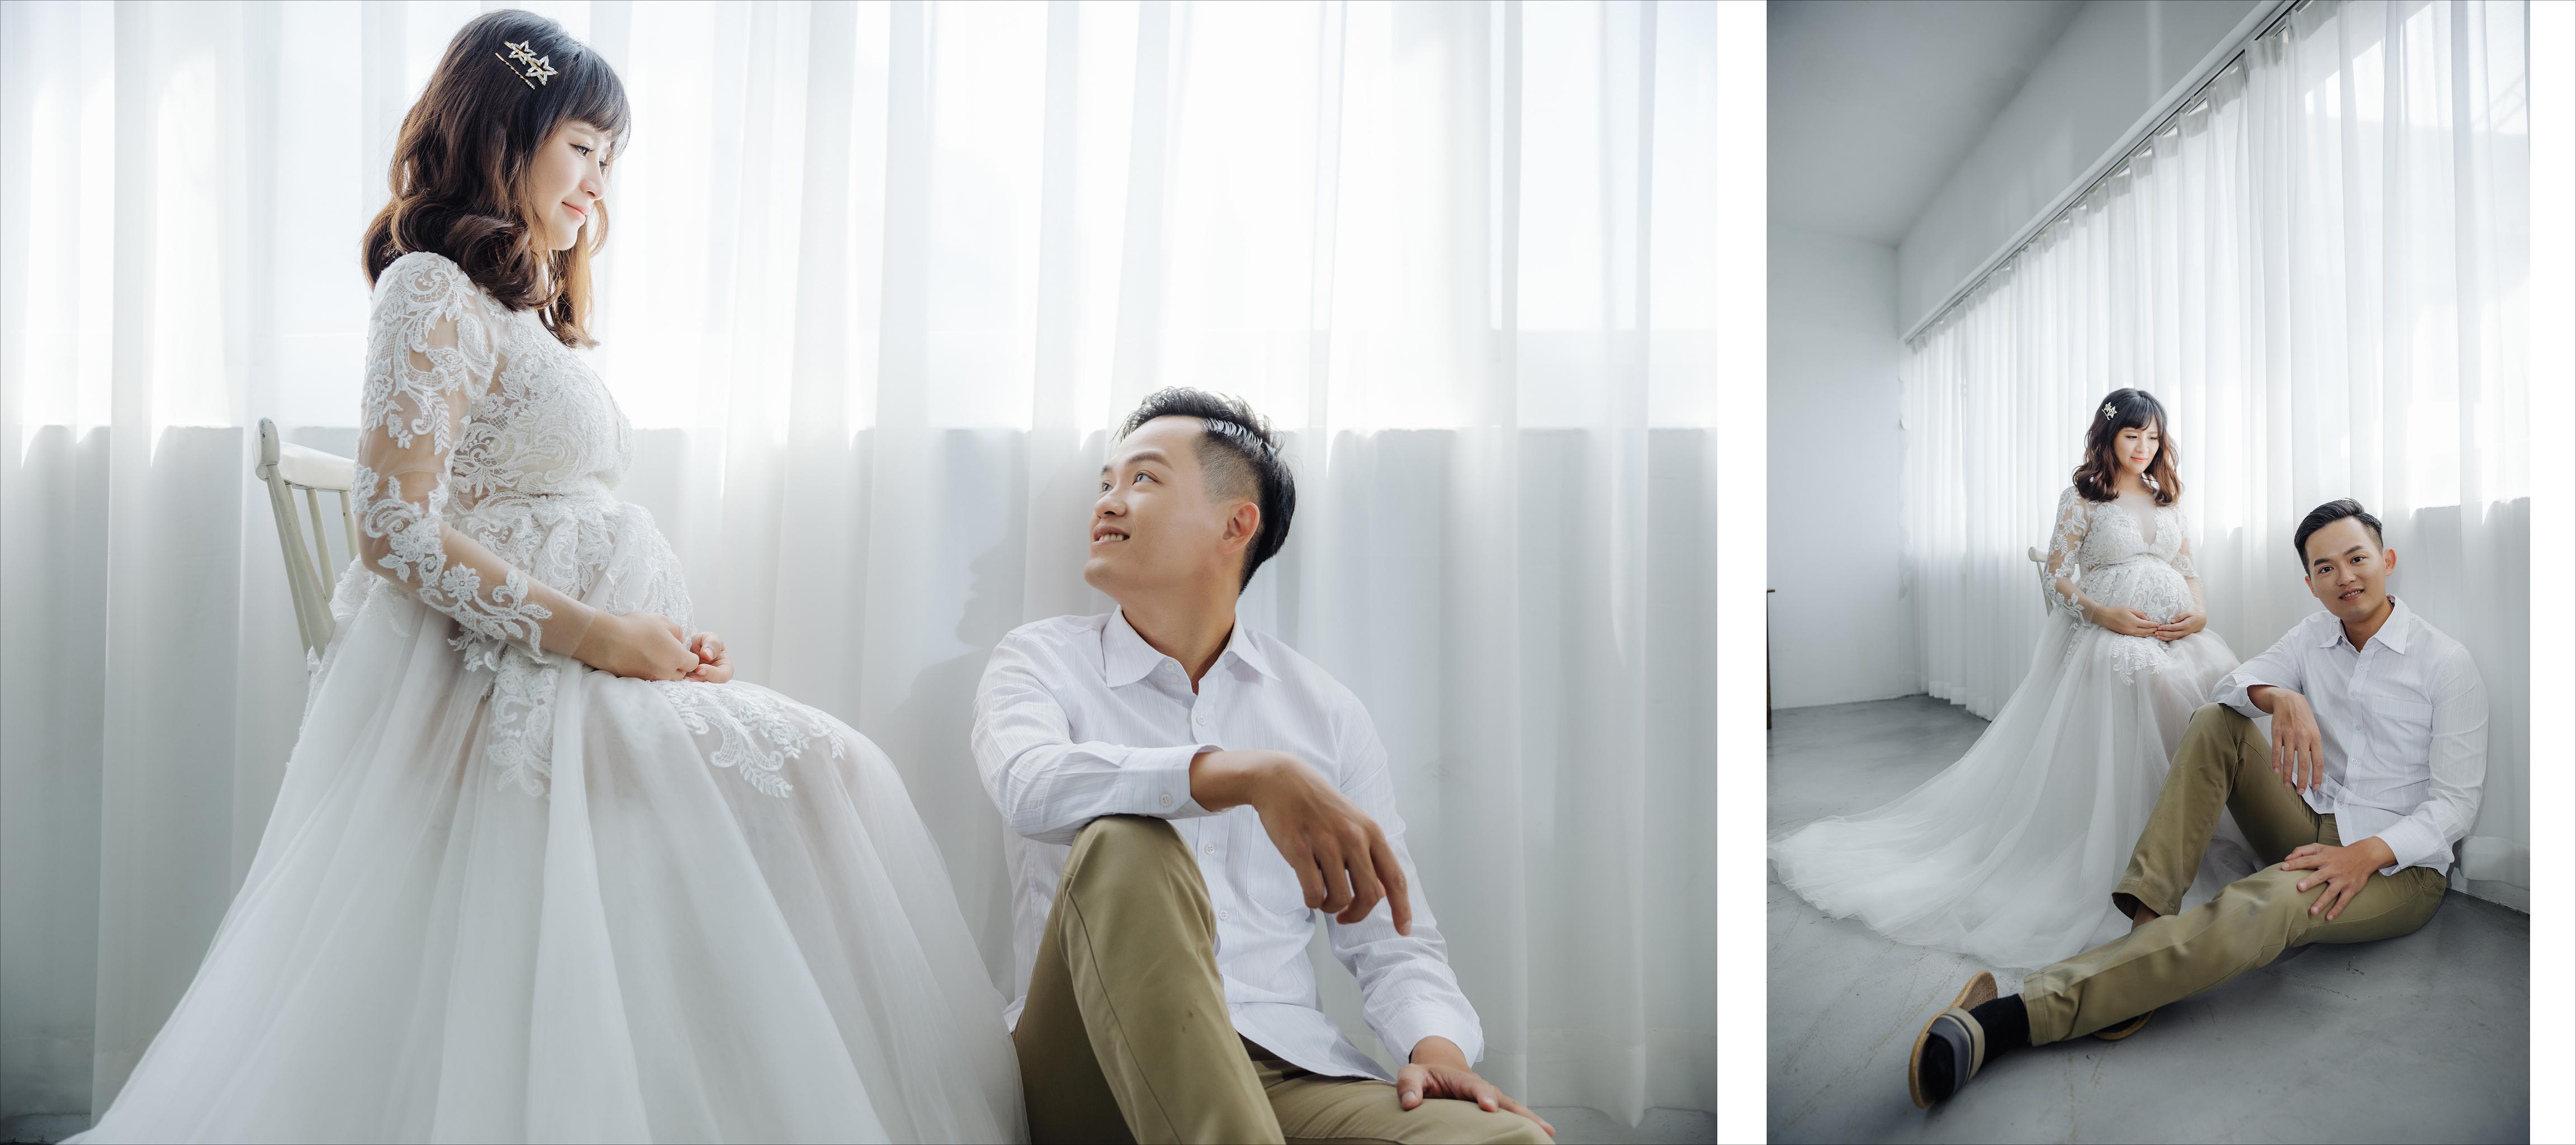 48972700908 9de23ea97b o - 【孕婦寫真】+如蕙&至宏+